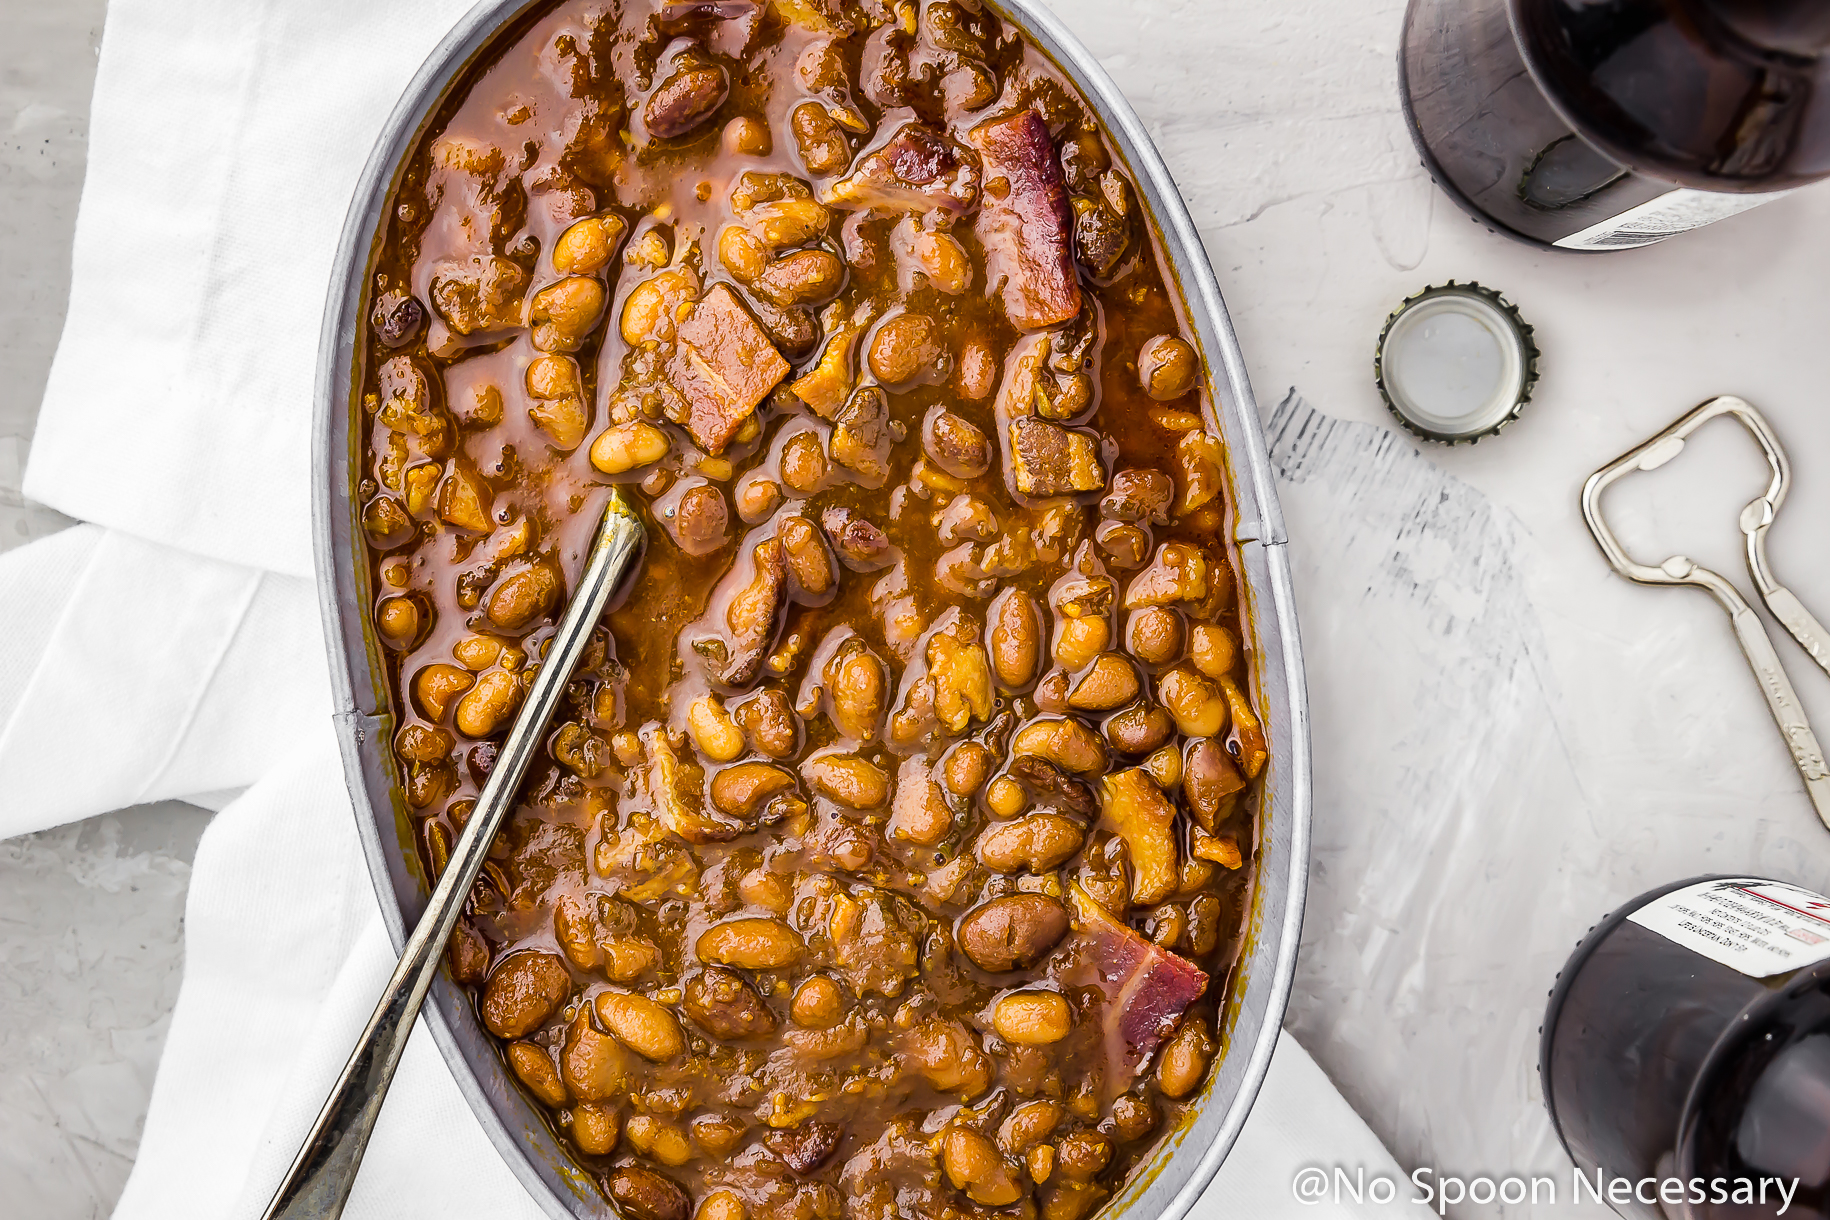 Bacon Bourbon & Brown Sugar Baked Beans